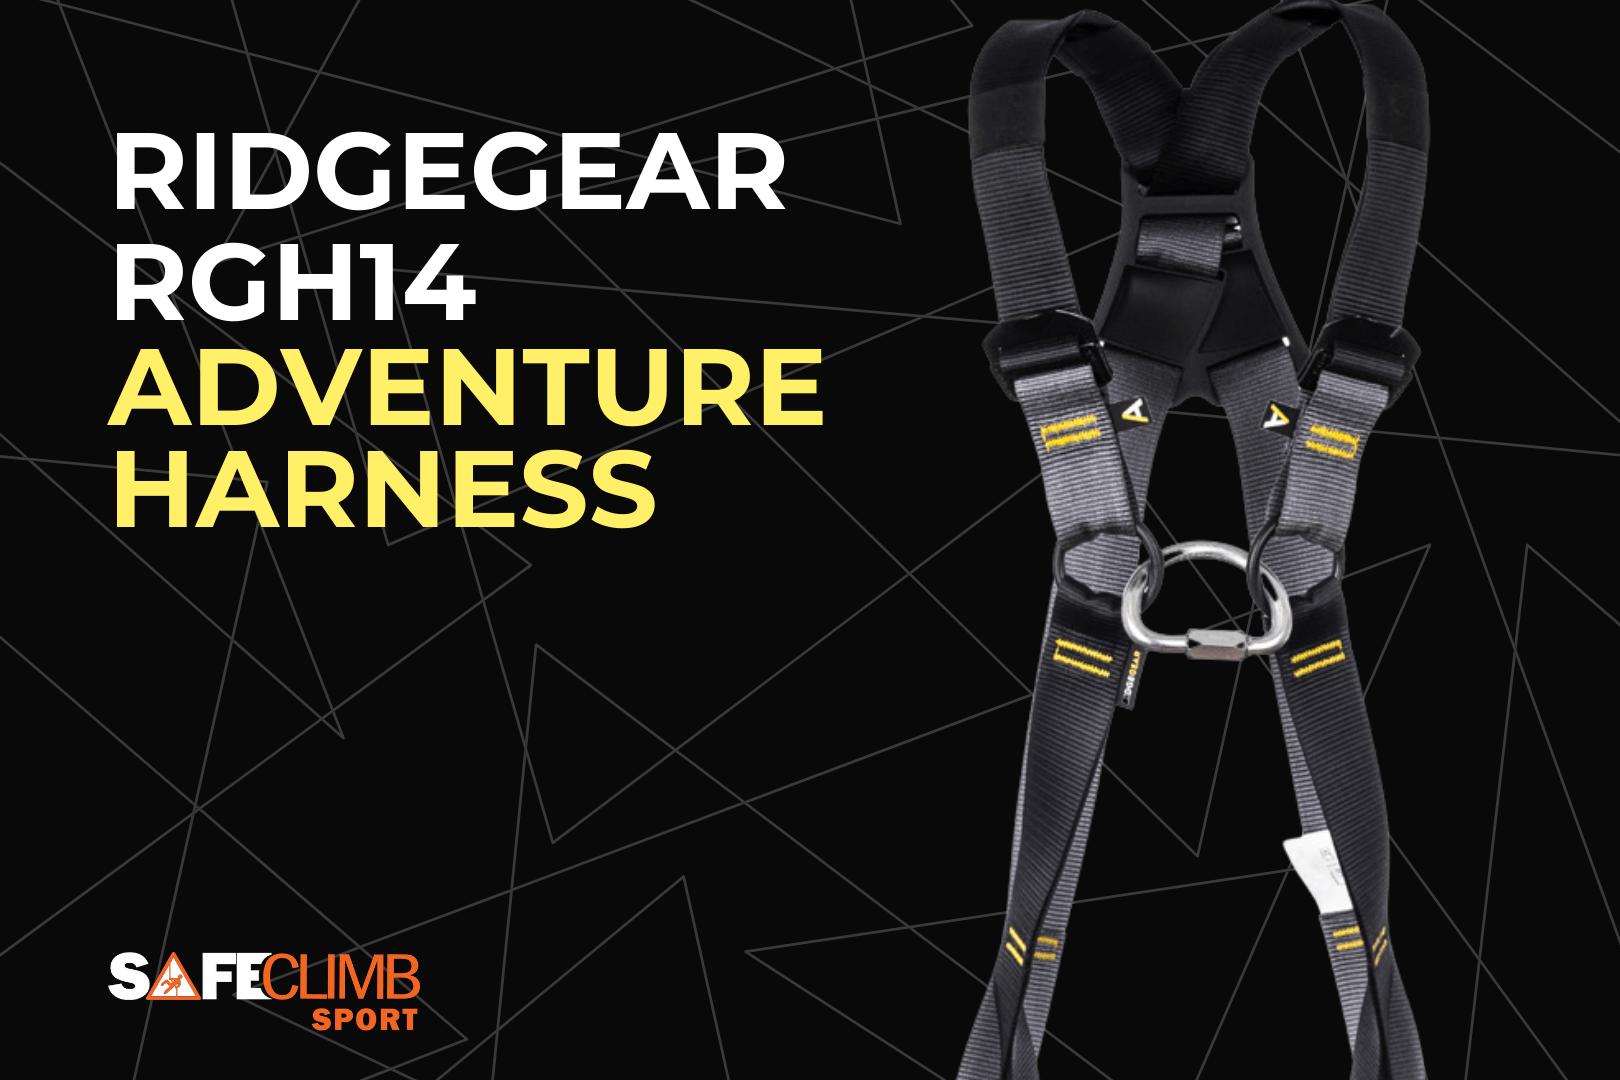 RidgeGear RGH14 Adventure Harness from SafeClimb